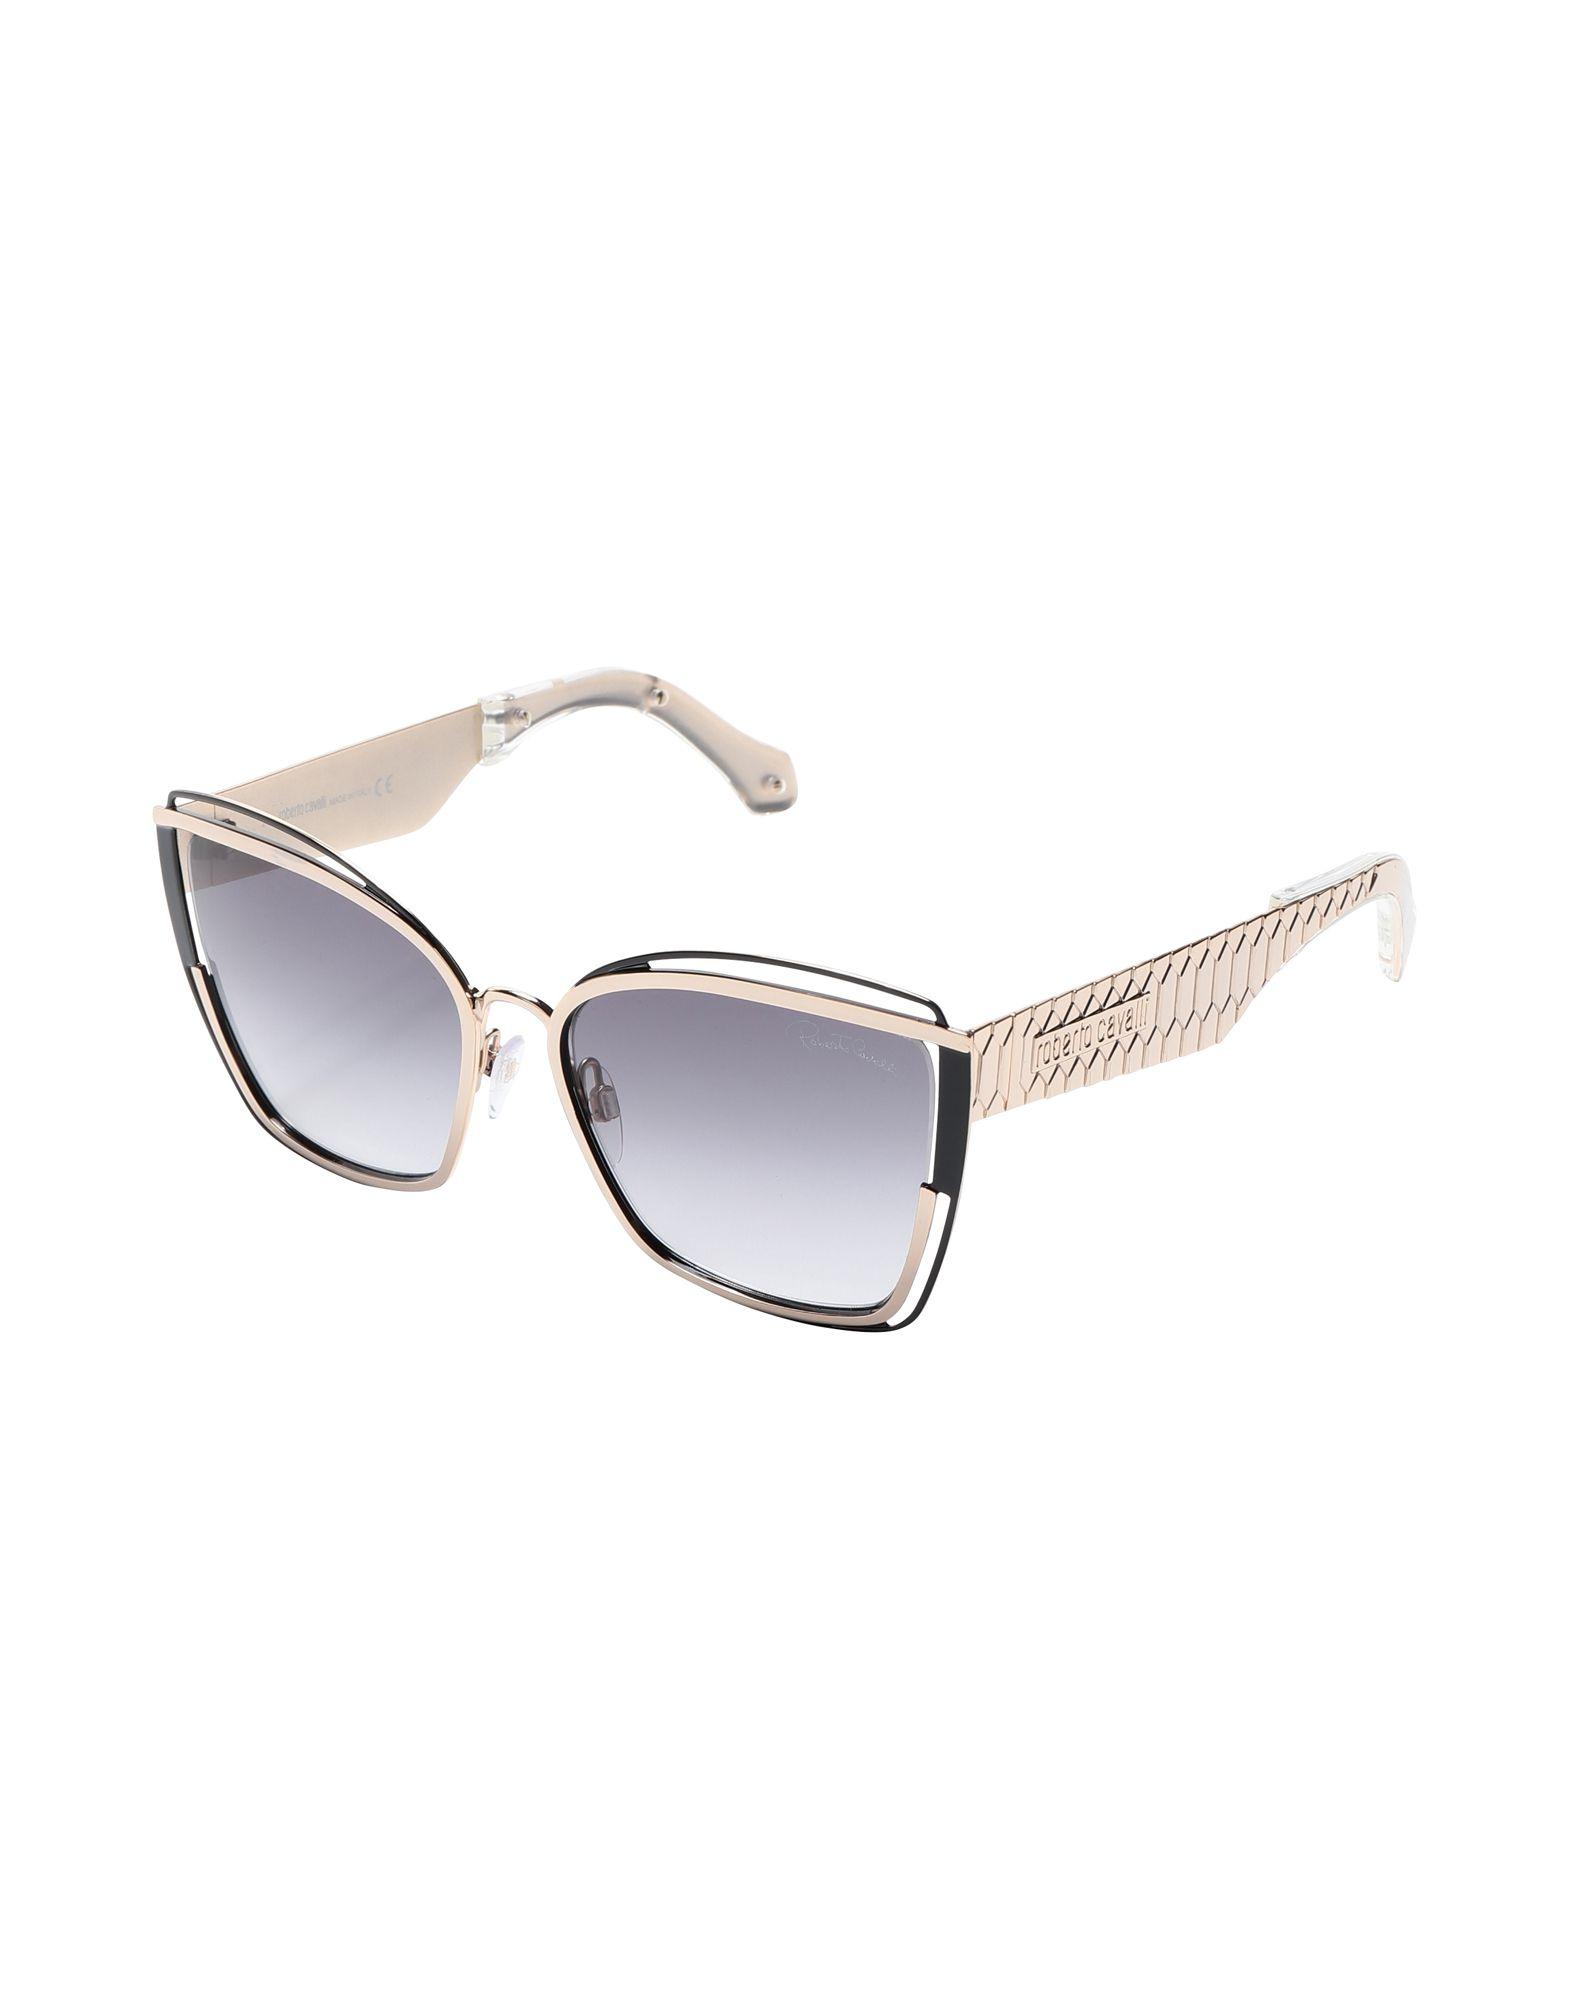 цена на ROBERTO CAVALLI Солнечные очки